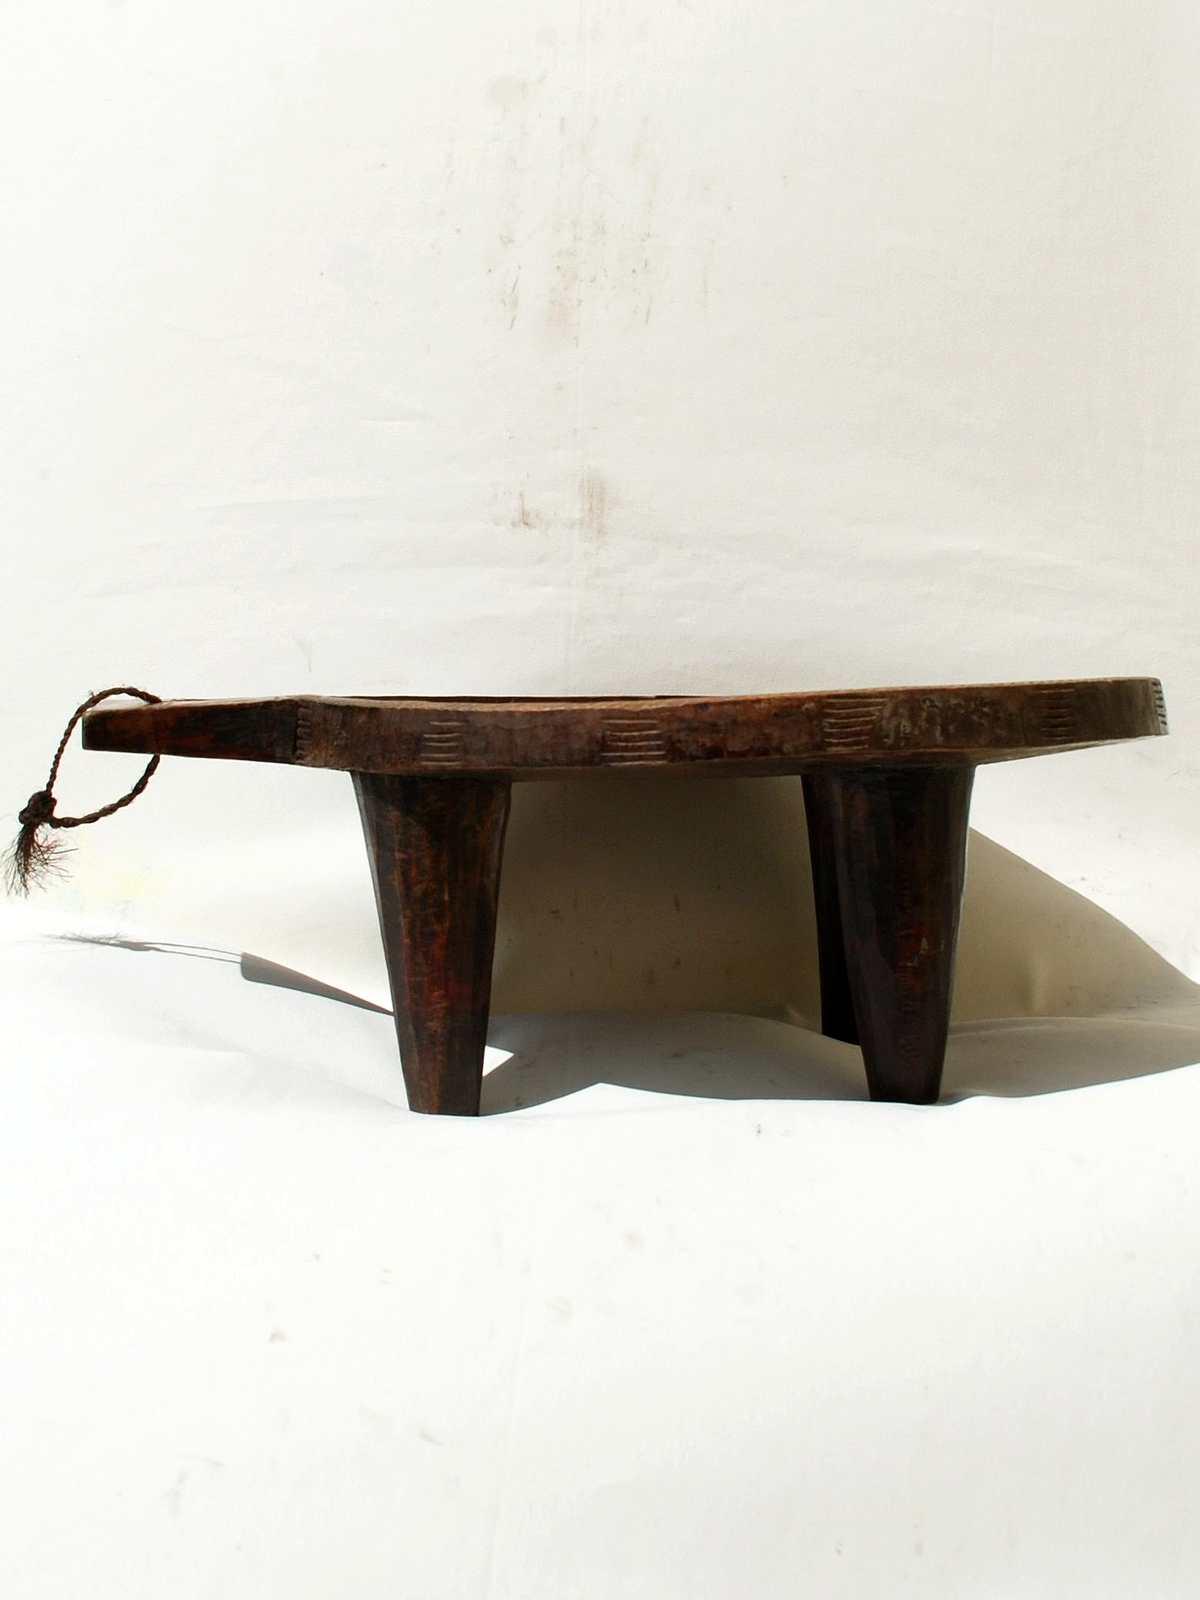 thiopien traditioneller kaffee tisch rekebot handarbeiit afrika m bel ebay. Black Bedroom Furniture Sets. Home Design Ideas